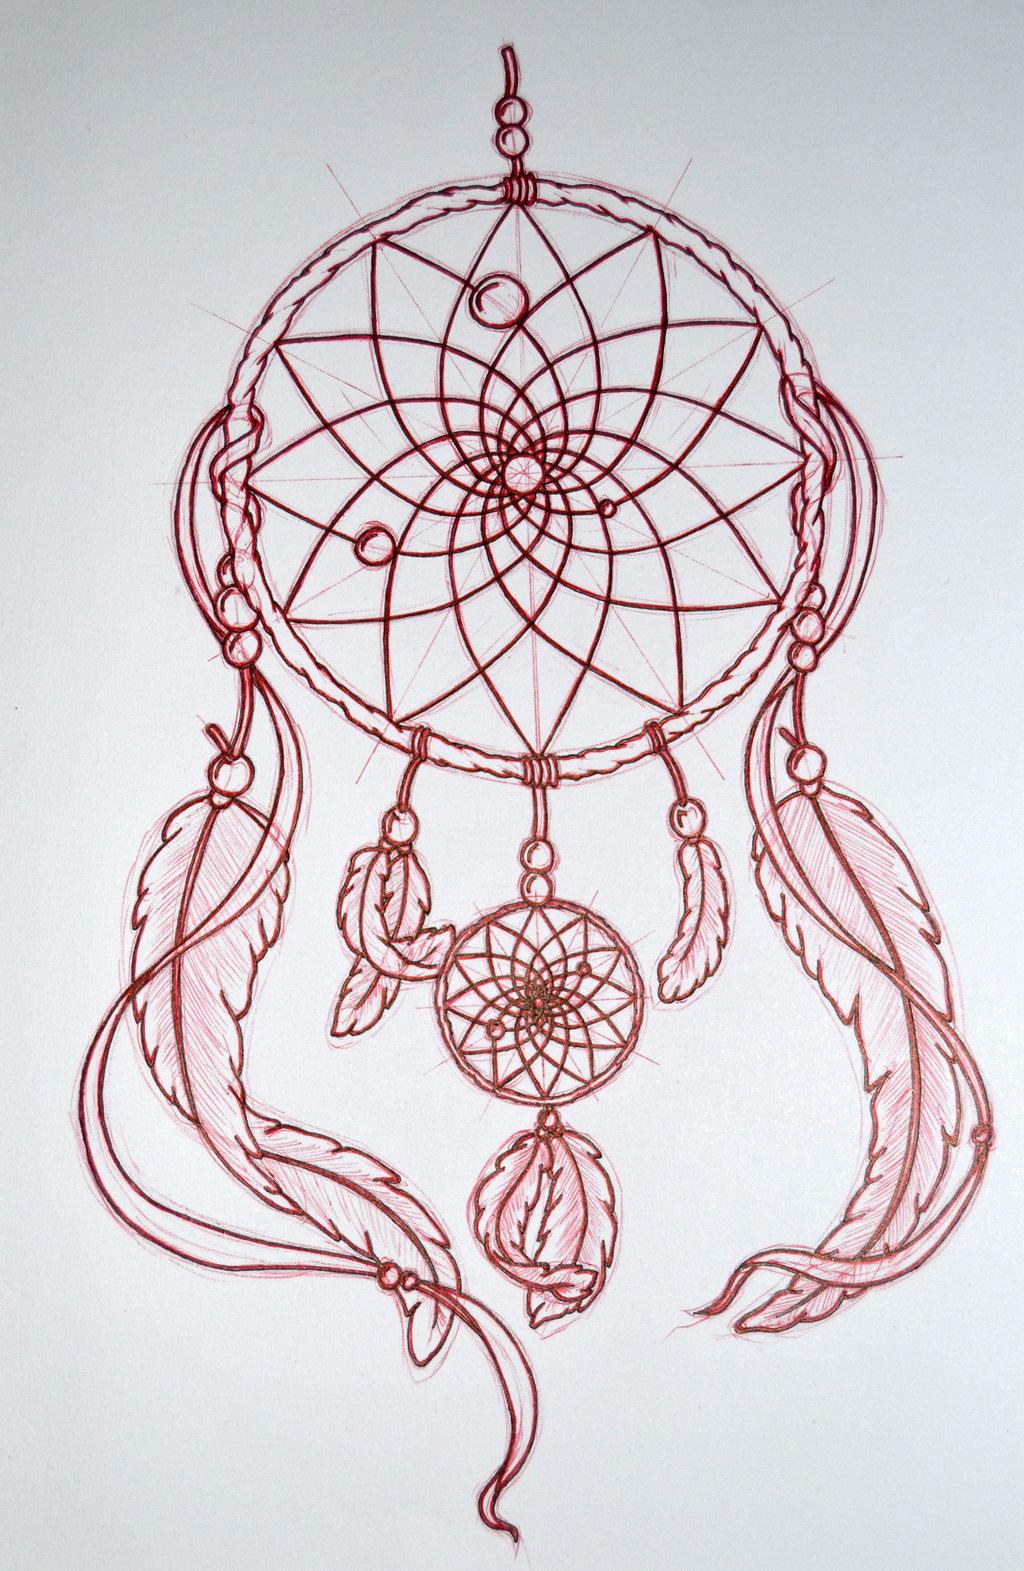 1024x1571 Mandala Dream Catcher Drawings